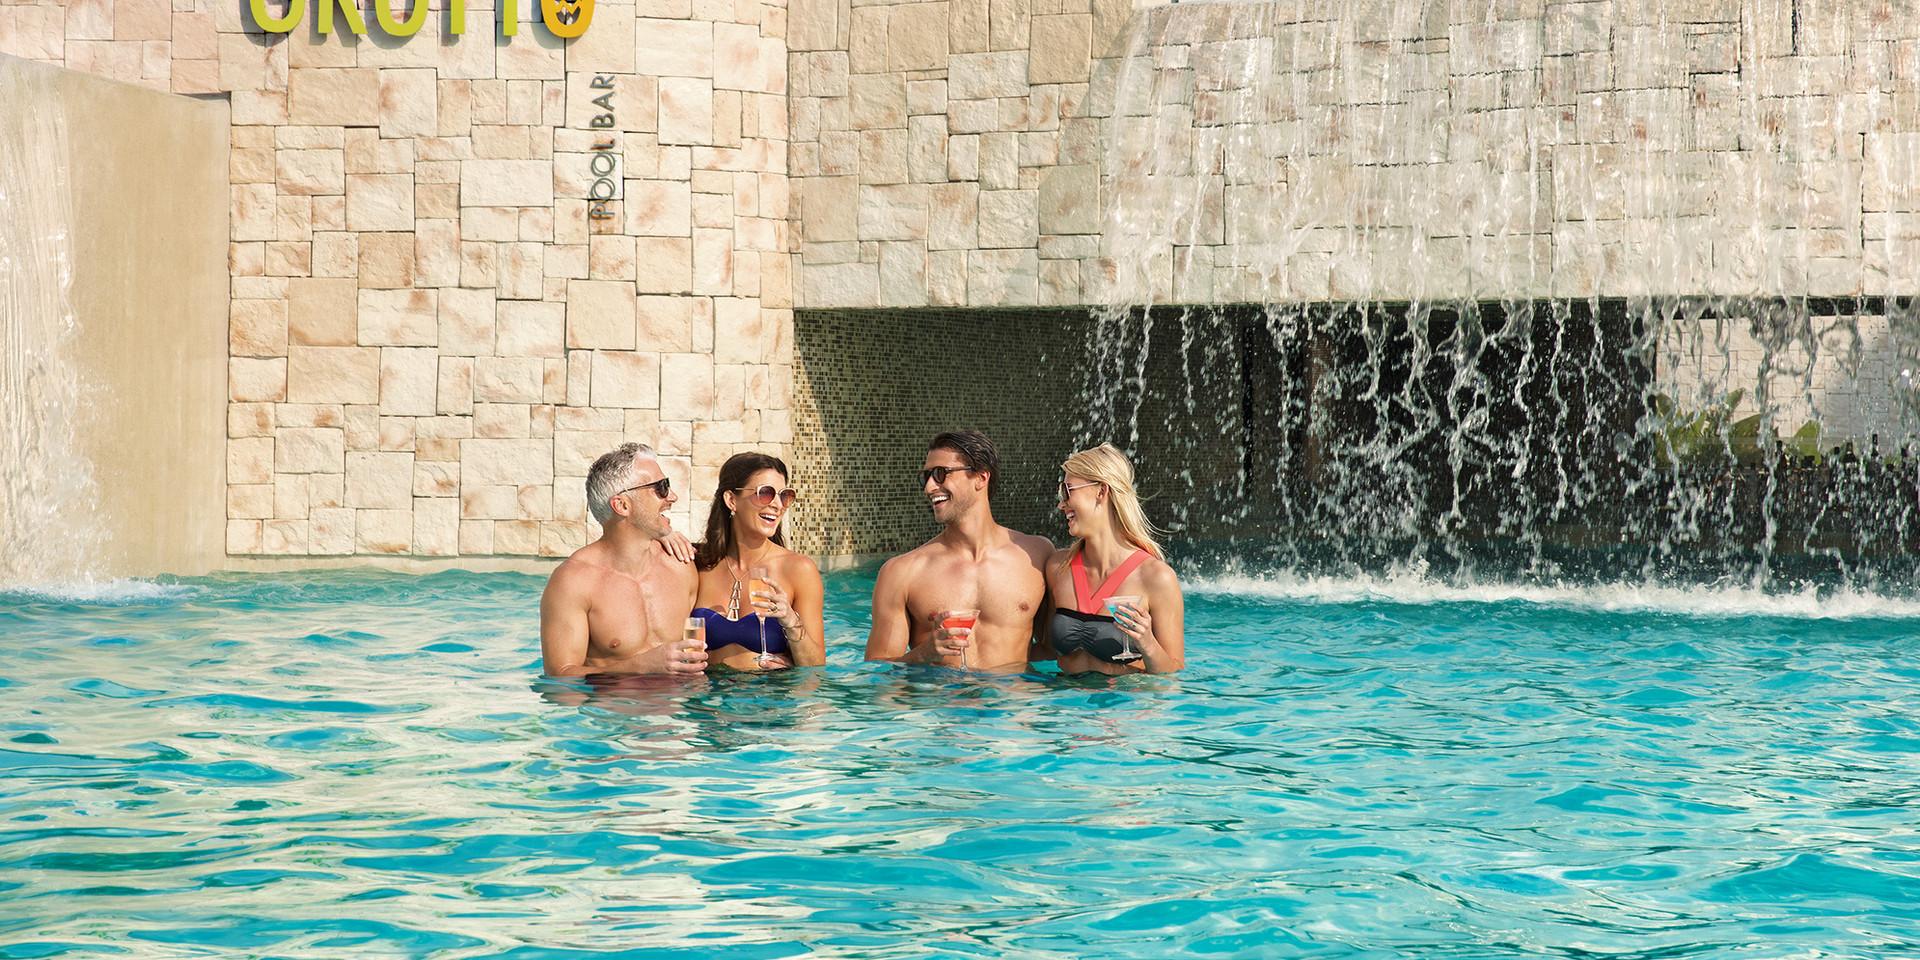 The Grotto | Swim-Up Bar